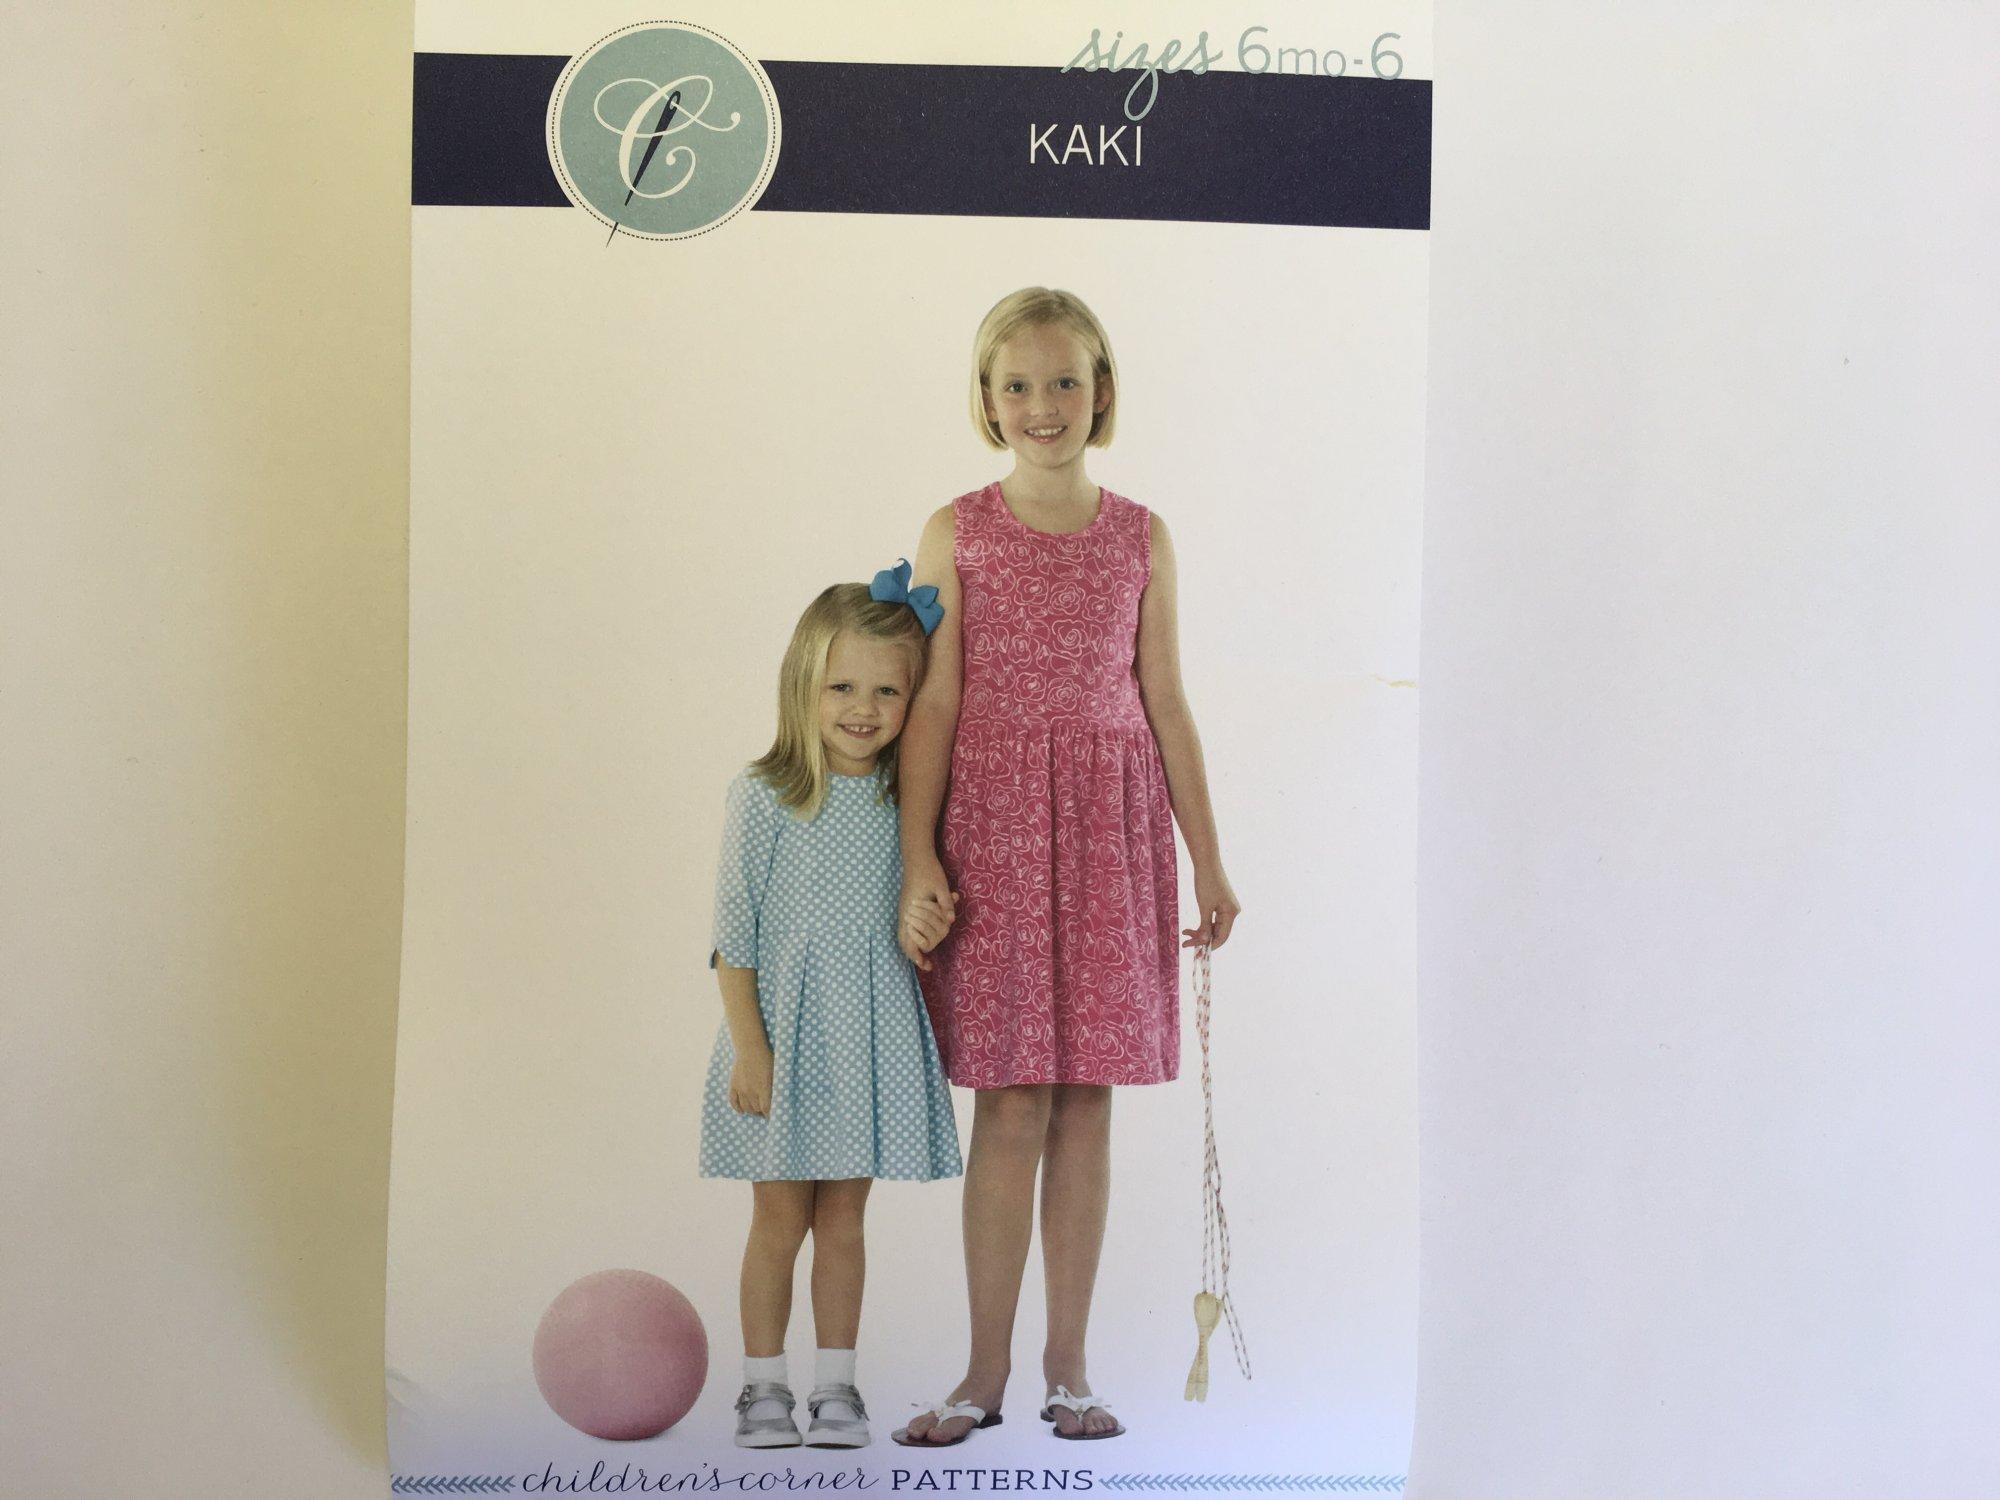 KAKI DRESS PATTERN by Childrens Corner  (size 6 months - 6 years)